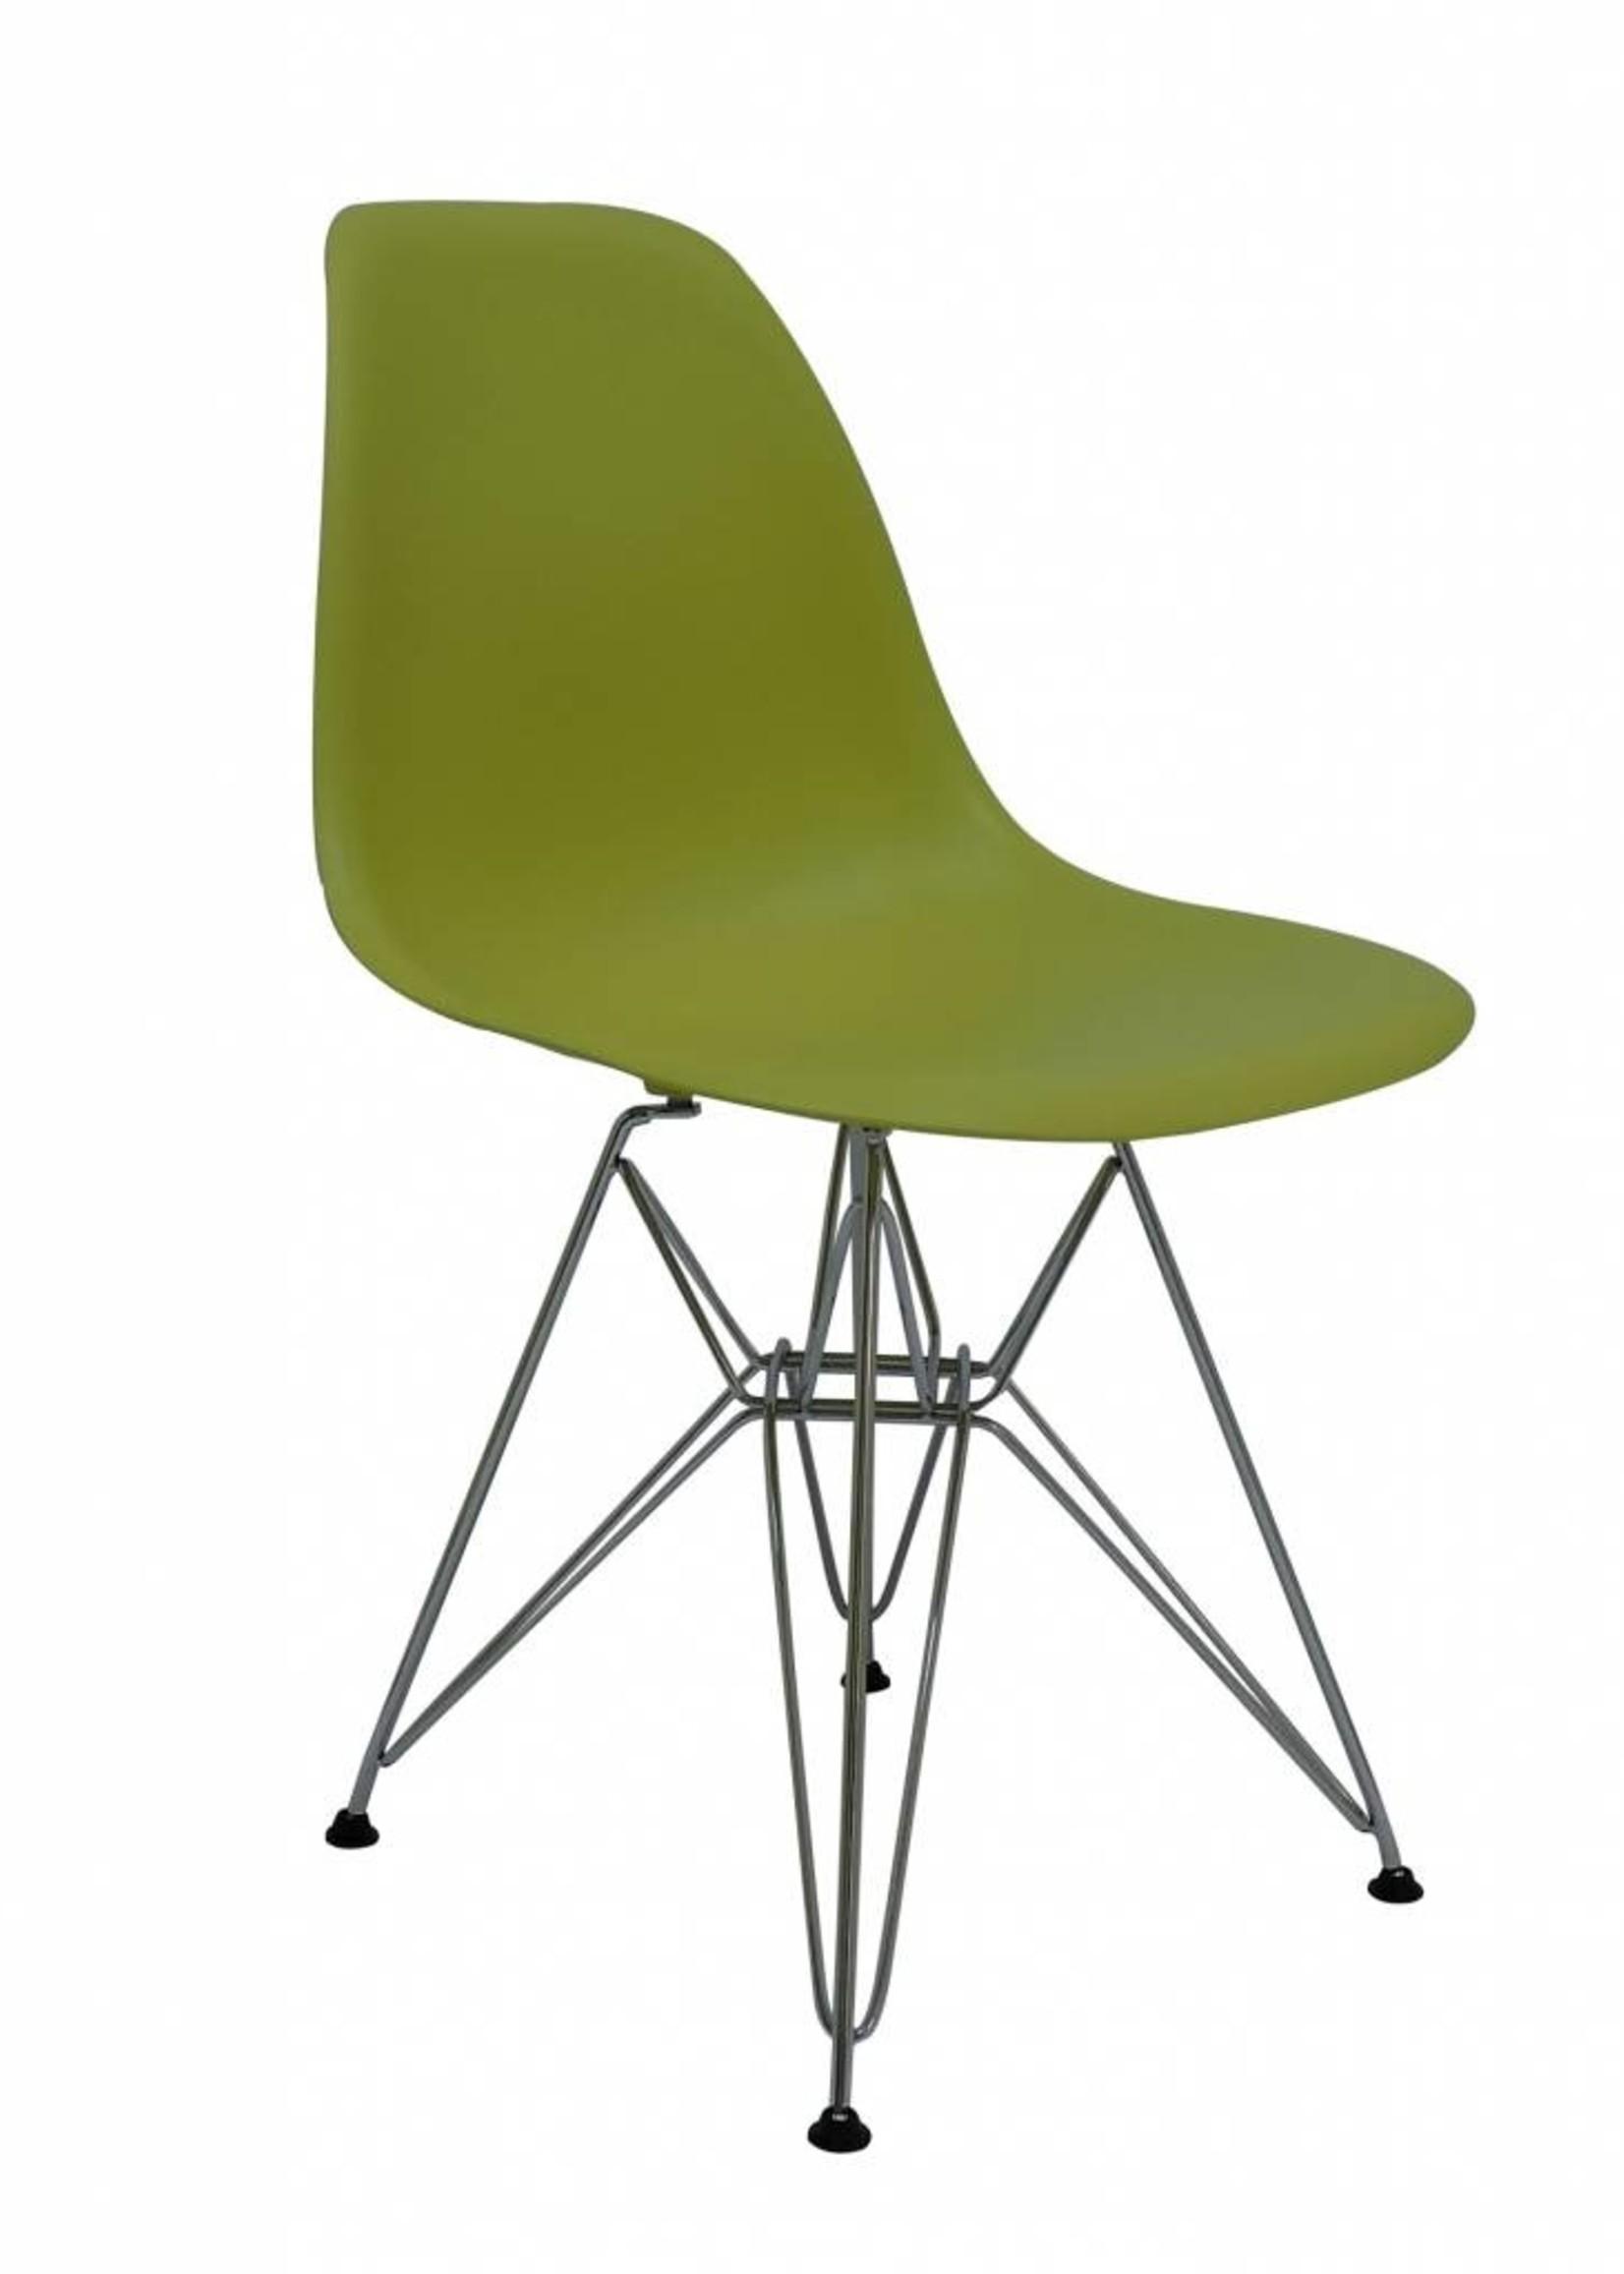 DSR Eames Design Stoel Groen